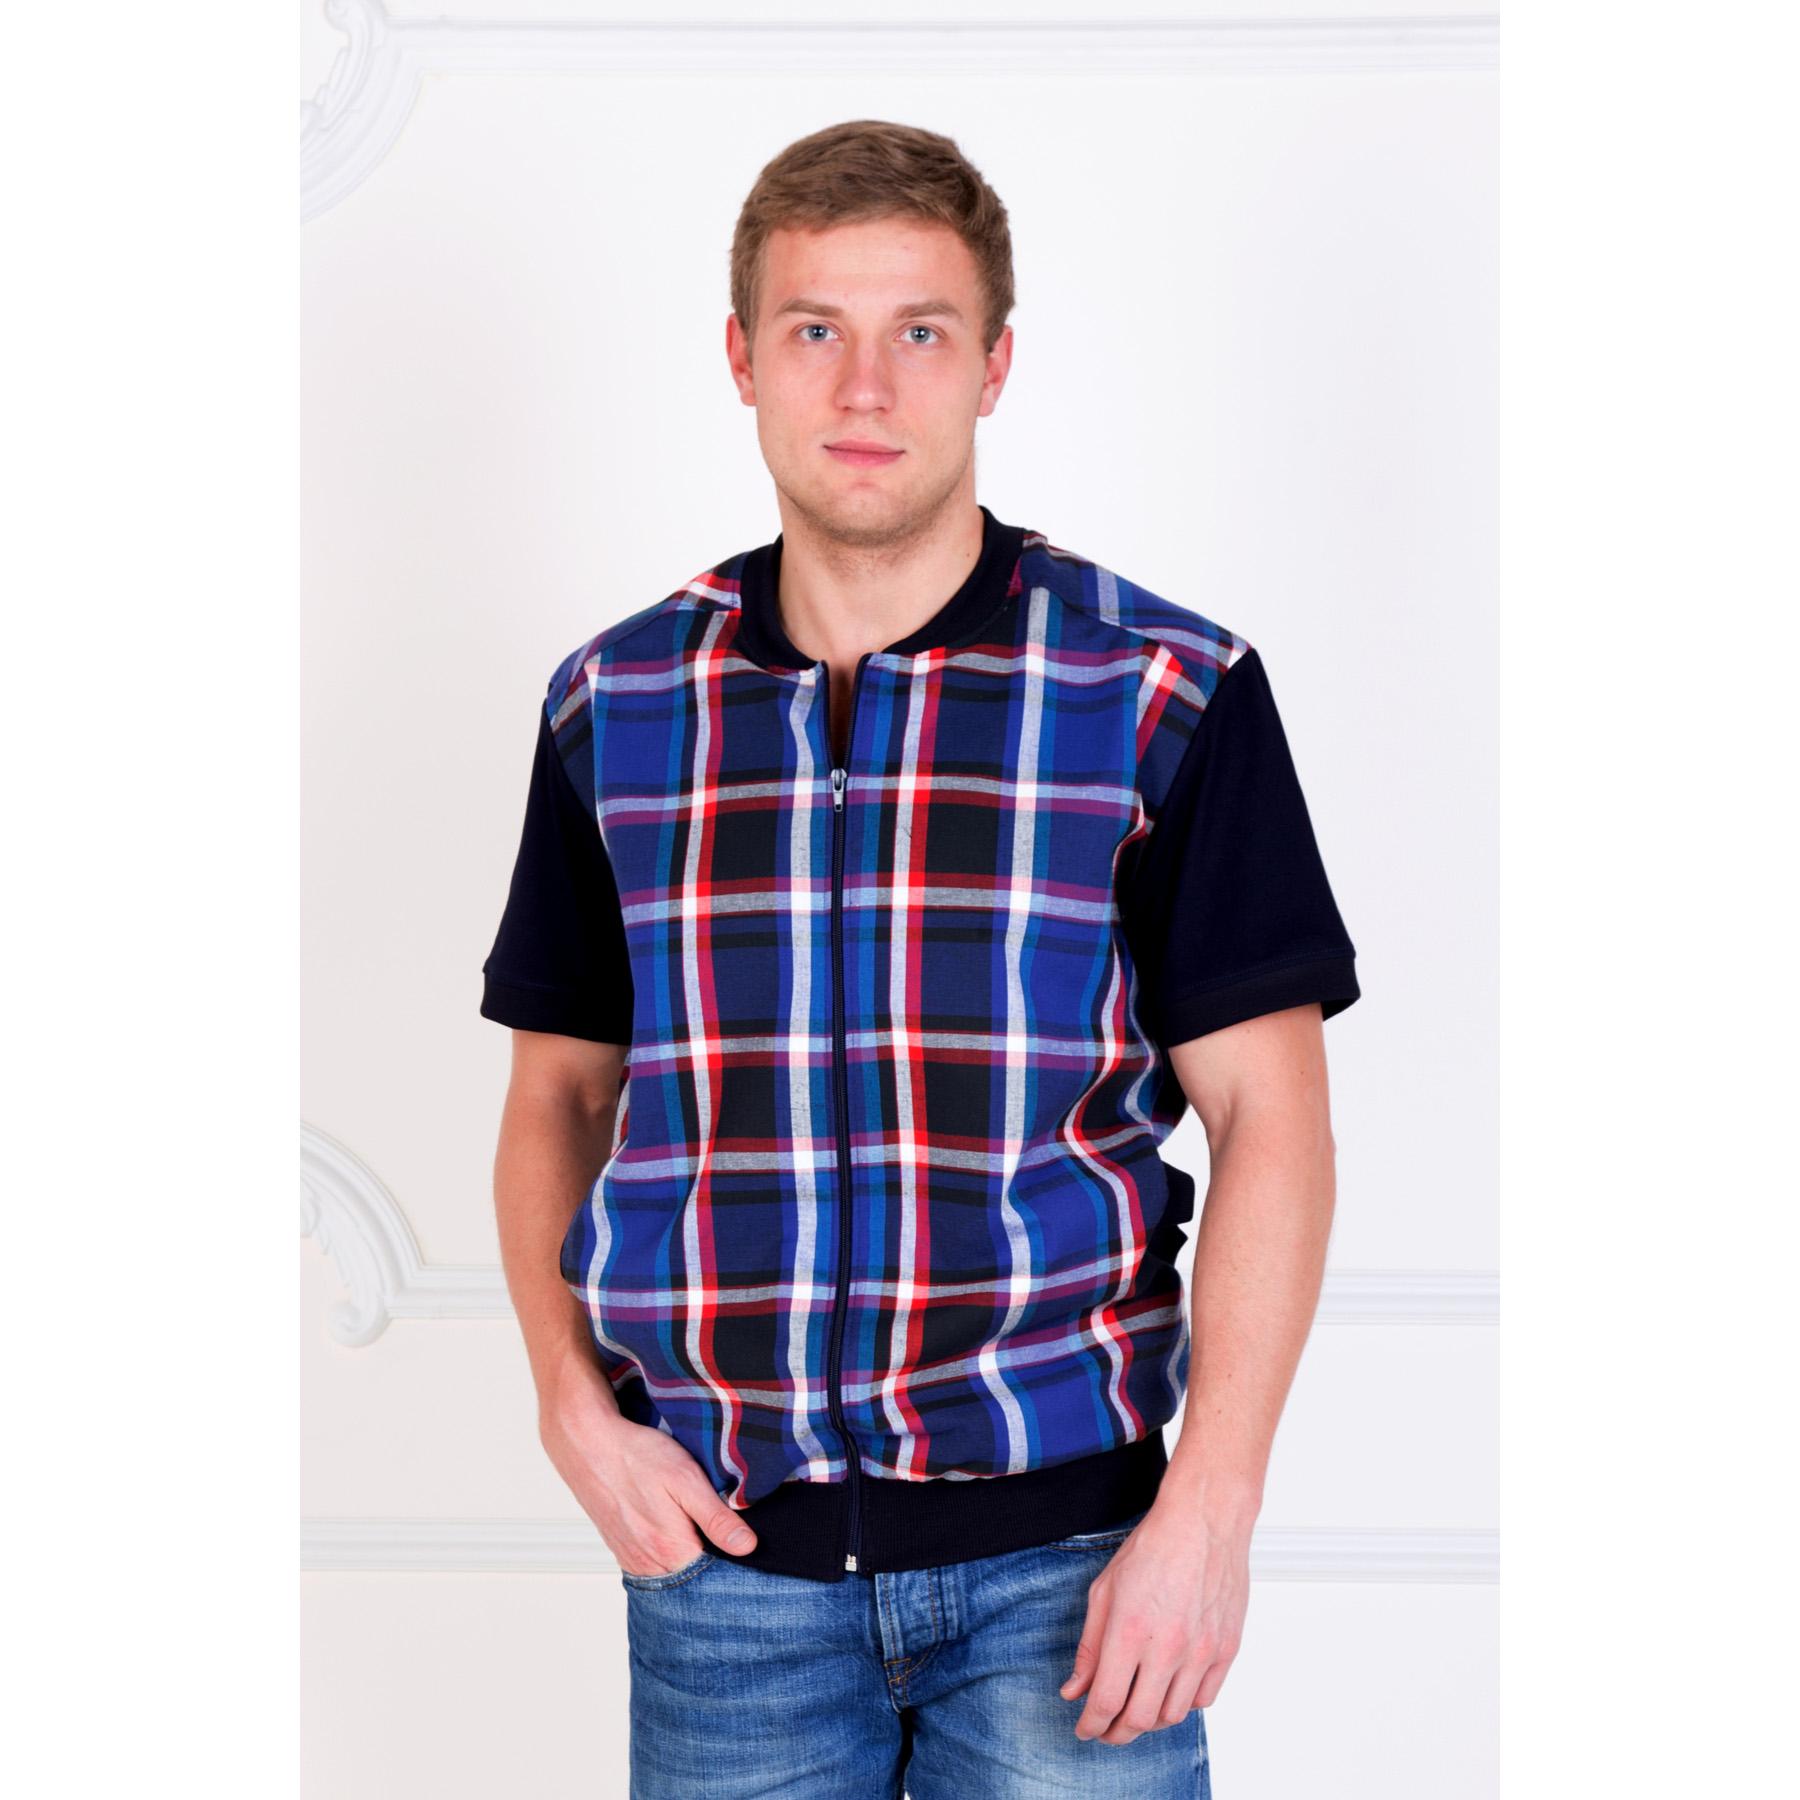 Мужская рубашка «Аполлон» , размер 44Рубашки<br>Обхват груди:88 см<br>Обхват талии:78 см<br>Обхват бедер:94 см<br>Рост:170-176 см<br><br>Тип: Муж. рубашка<br>Размер: 44<br>Материал: Шотландка